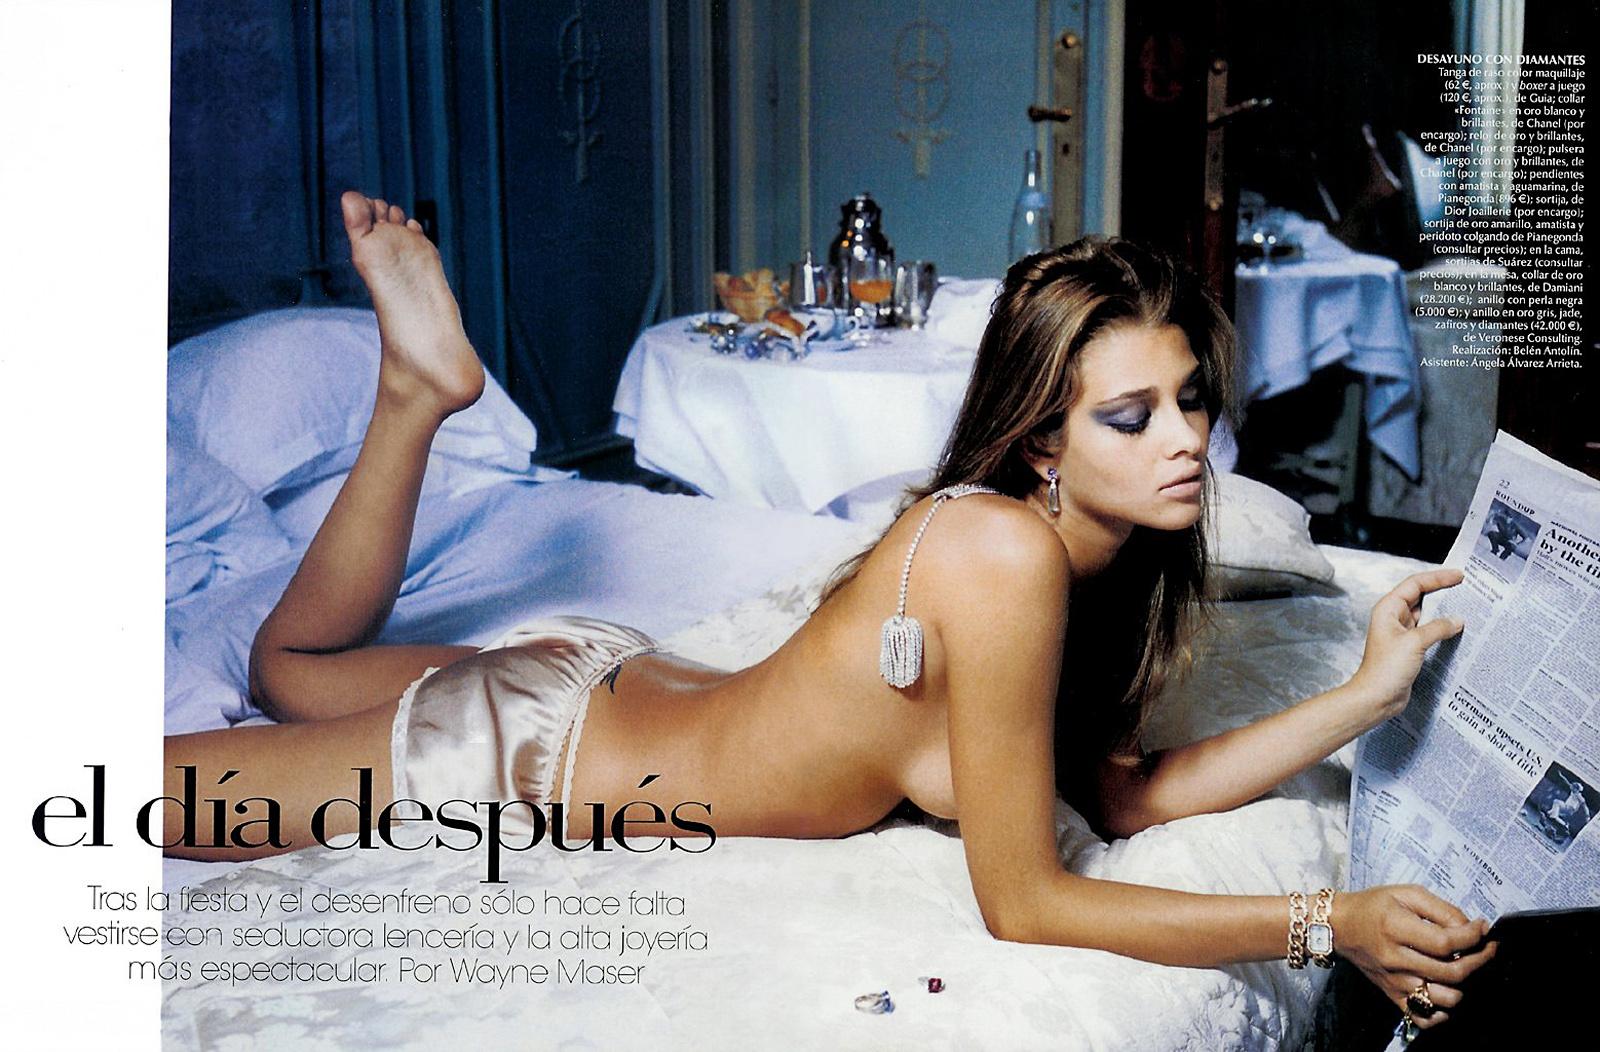 Alexis adams holds her legs wide open 4